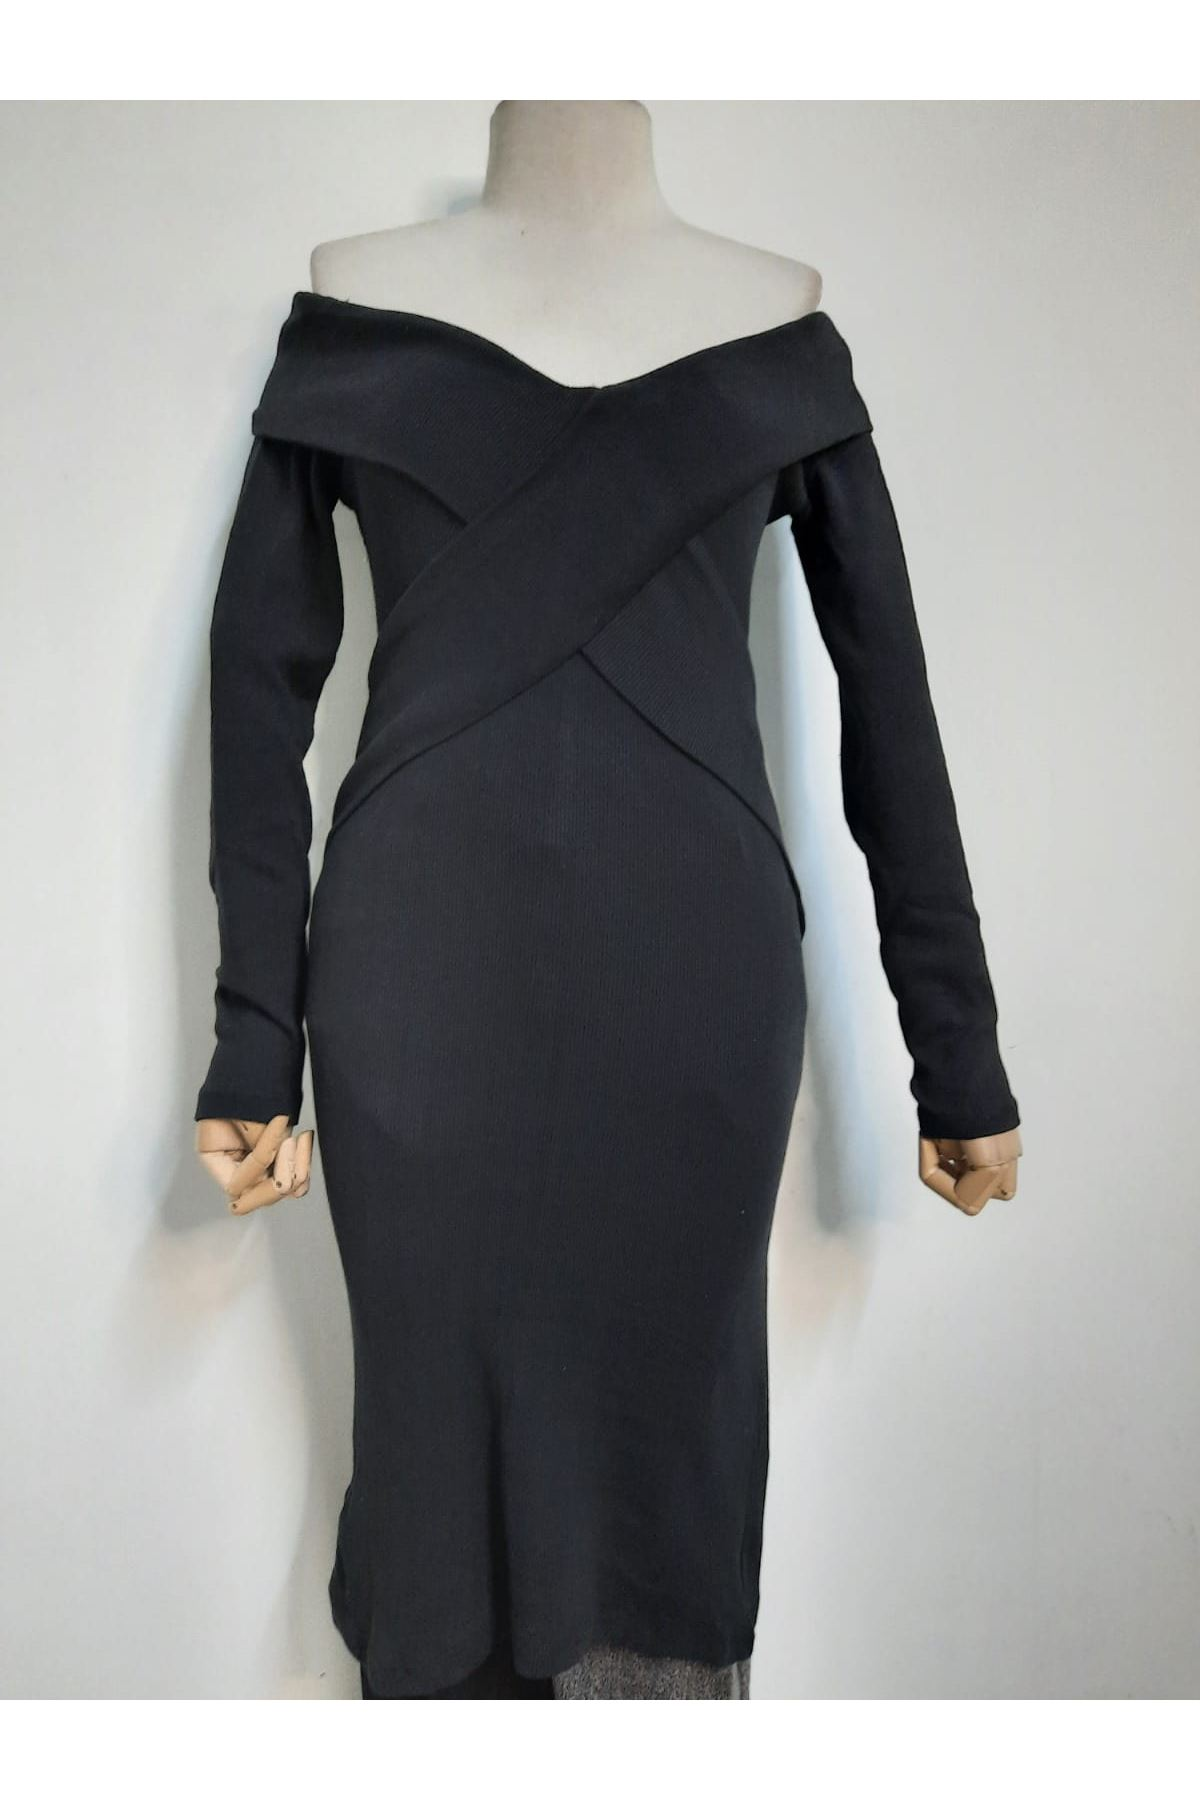 Çapraz Kaşkorse Elbise - SİYAH